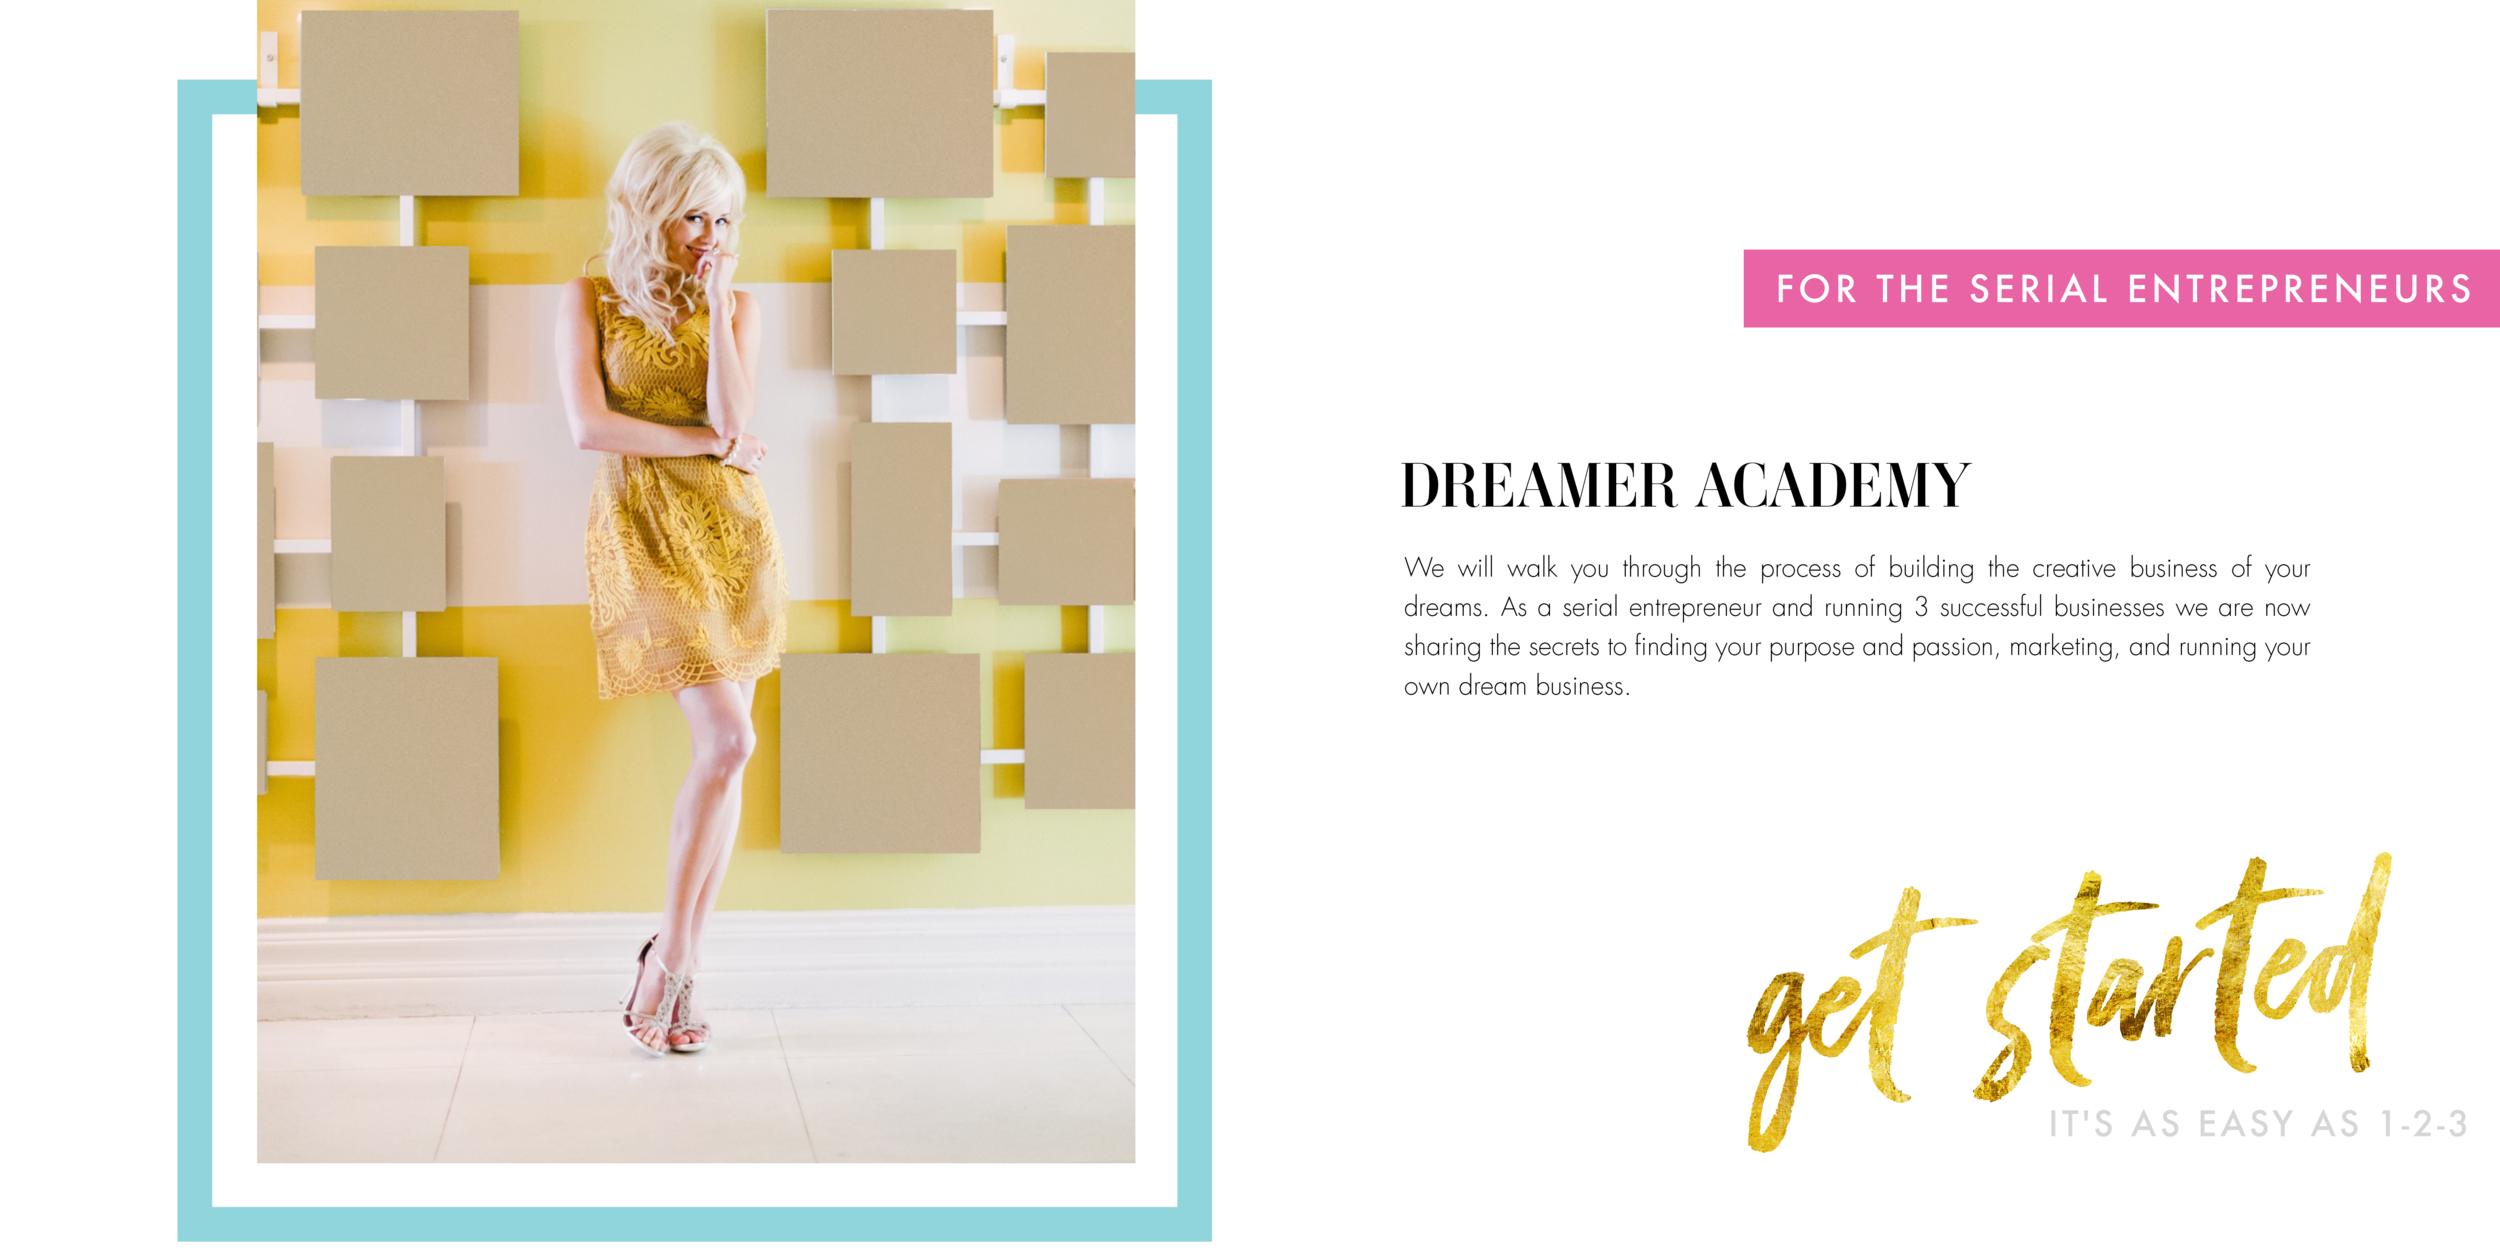 Confetti_Academy_Dreamer_V3.png